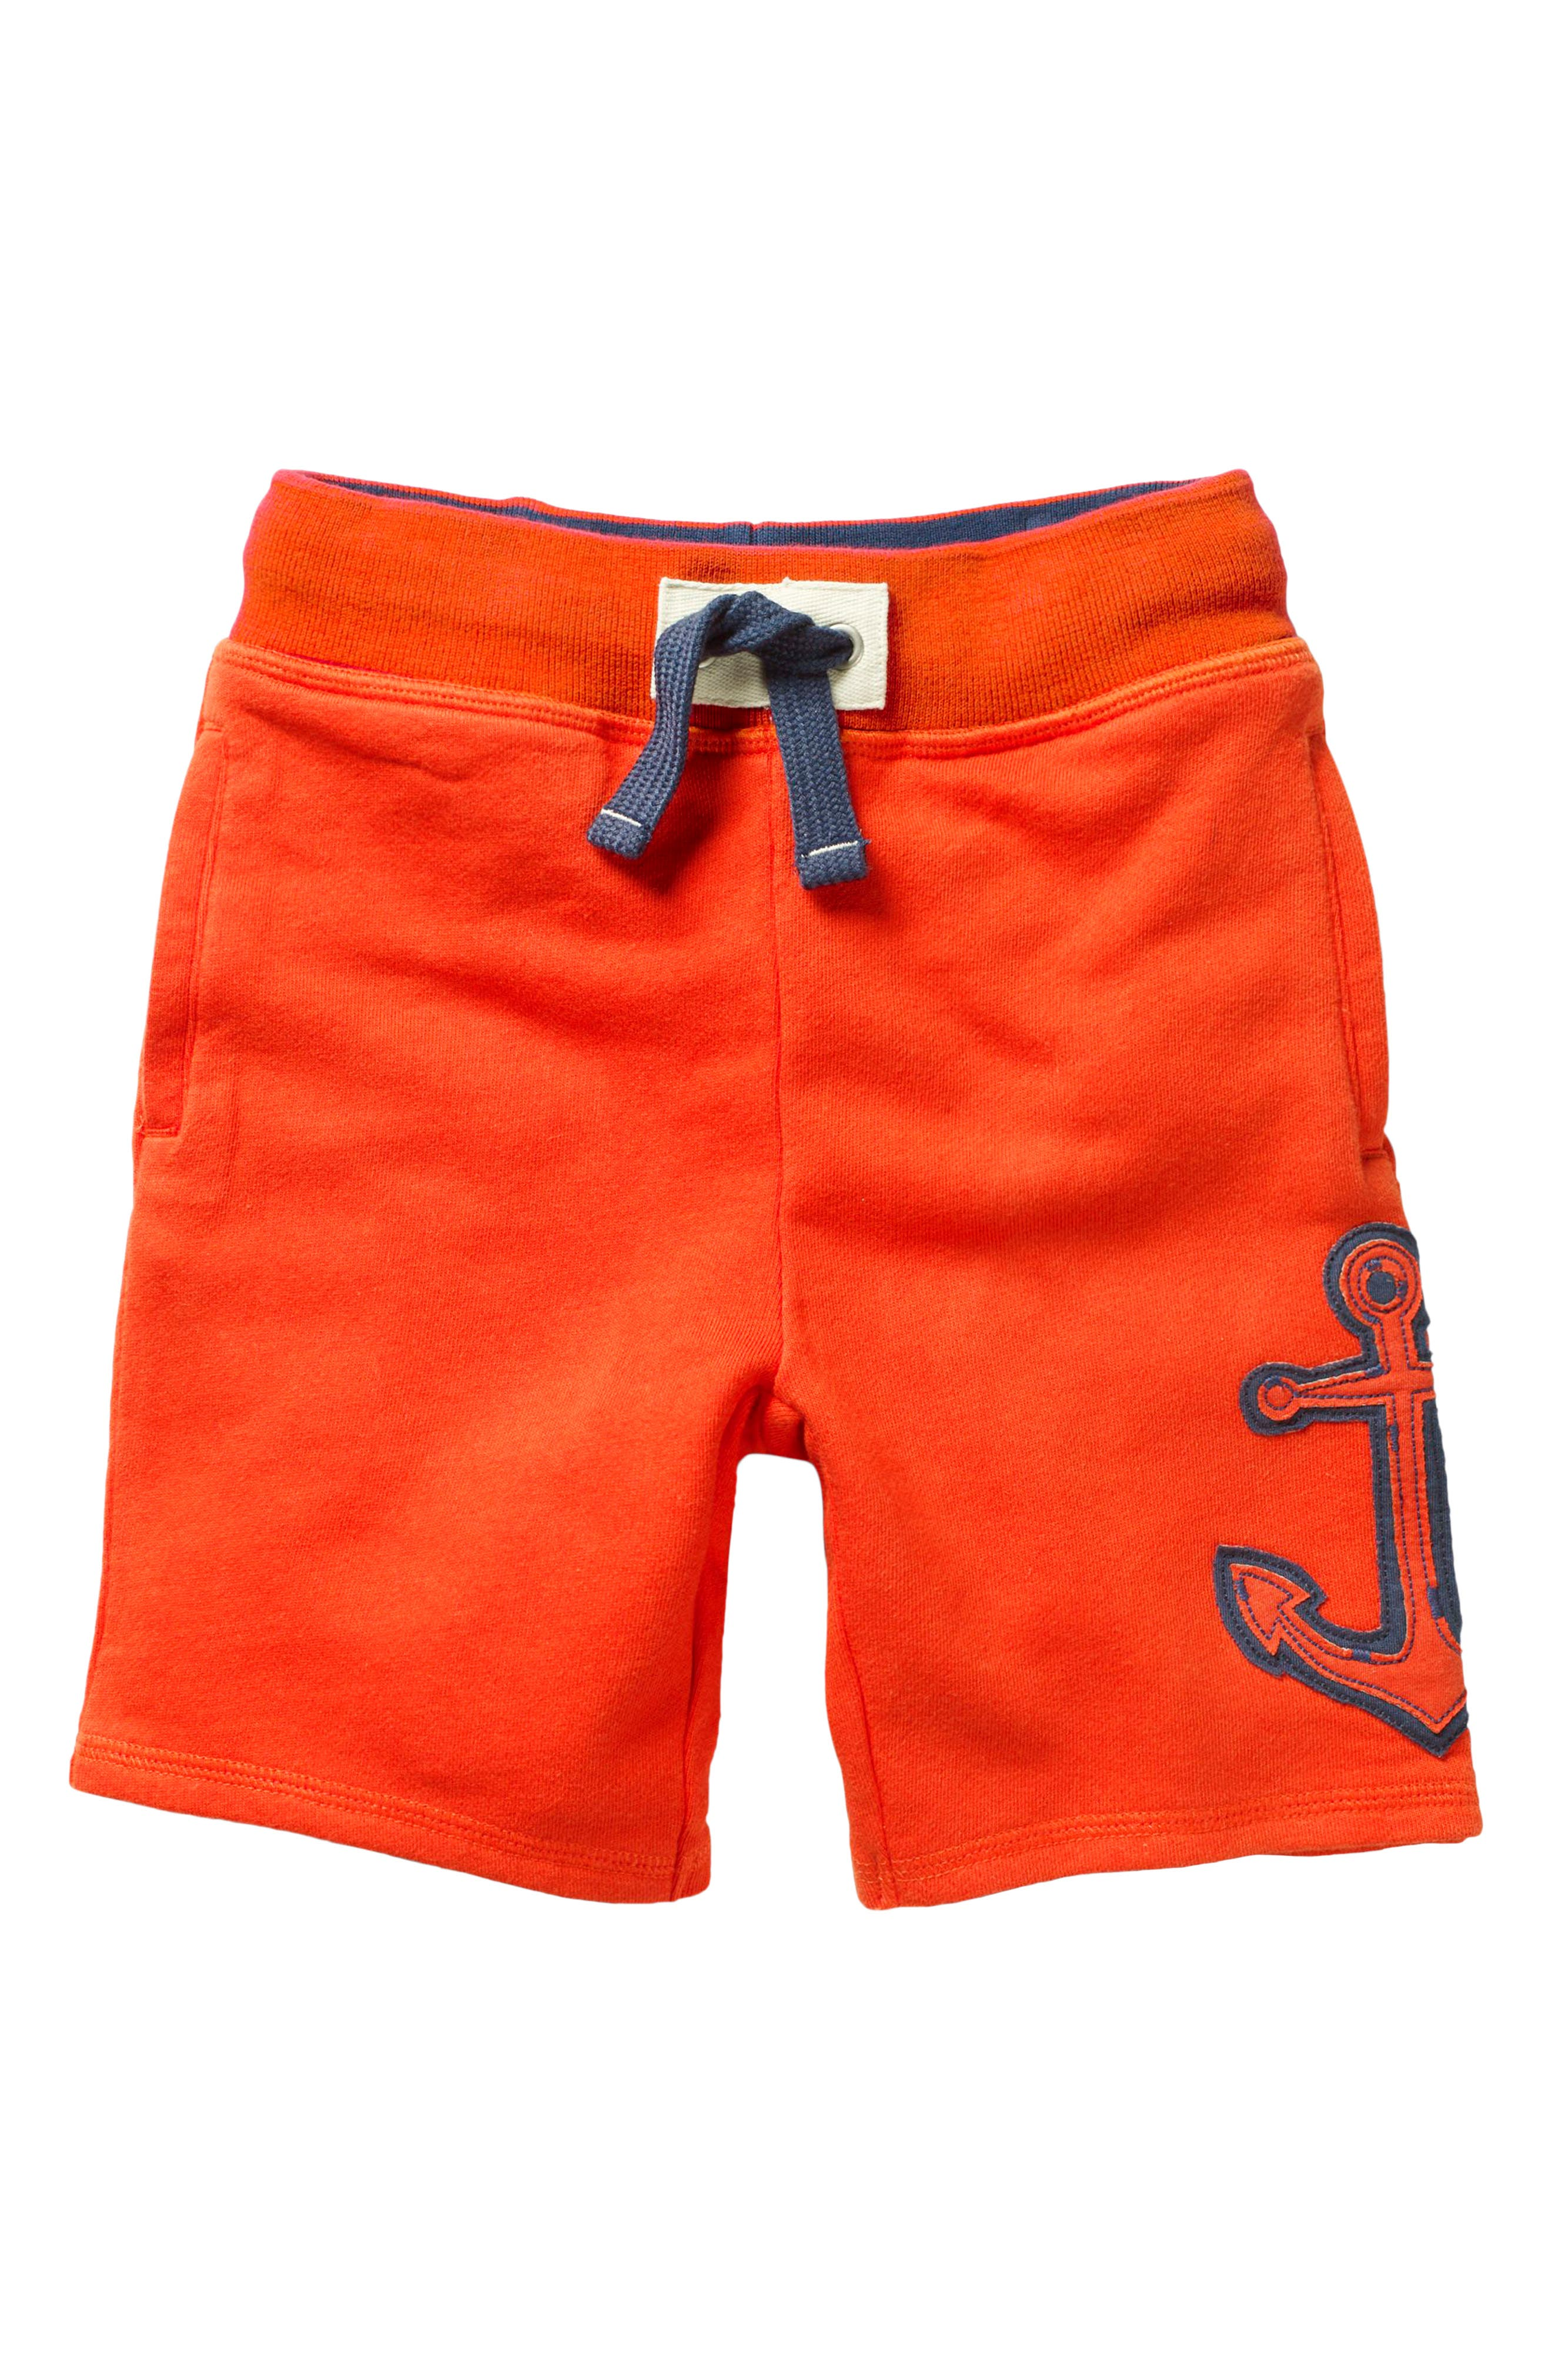 Appliqué Knit Shorts,                         Main,                         color, Ziggy Red Anchor